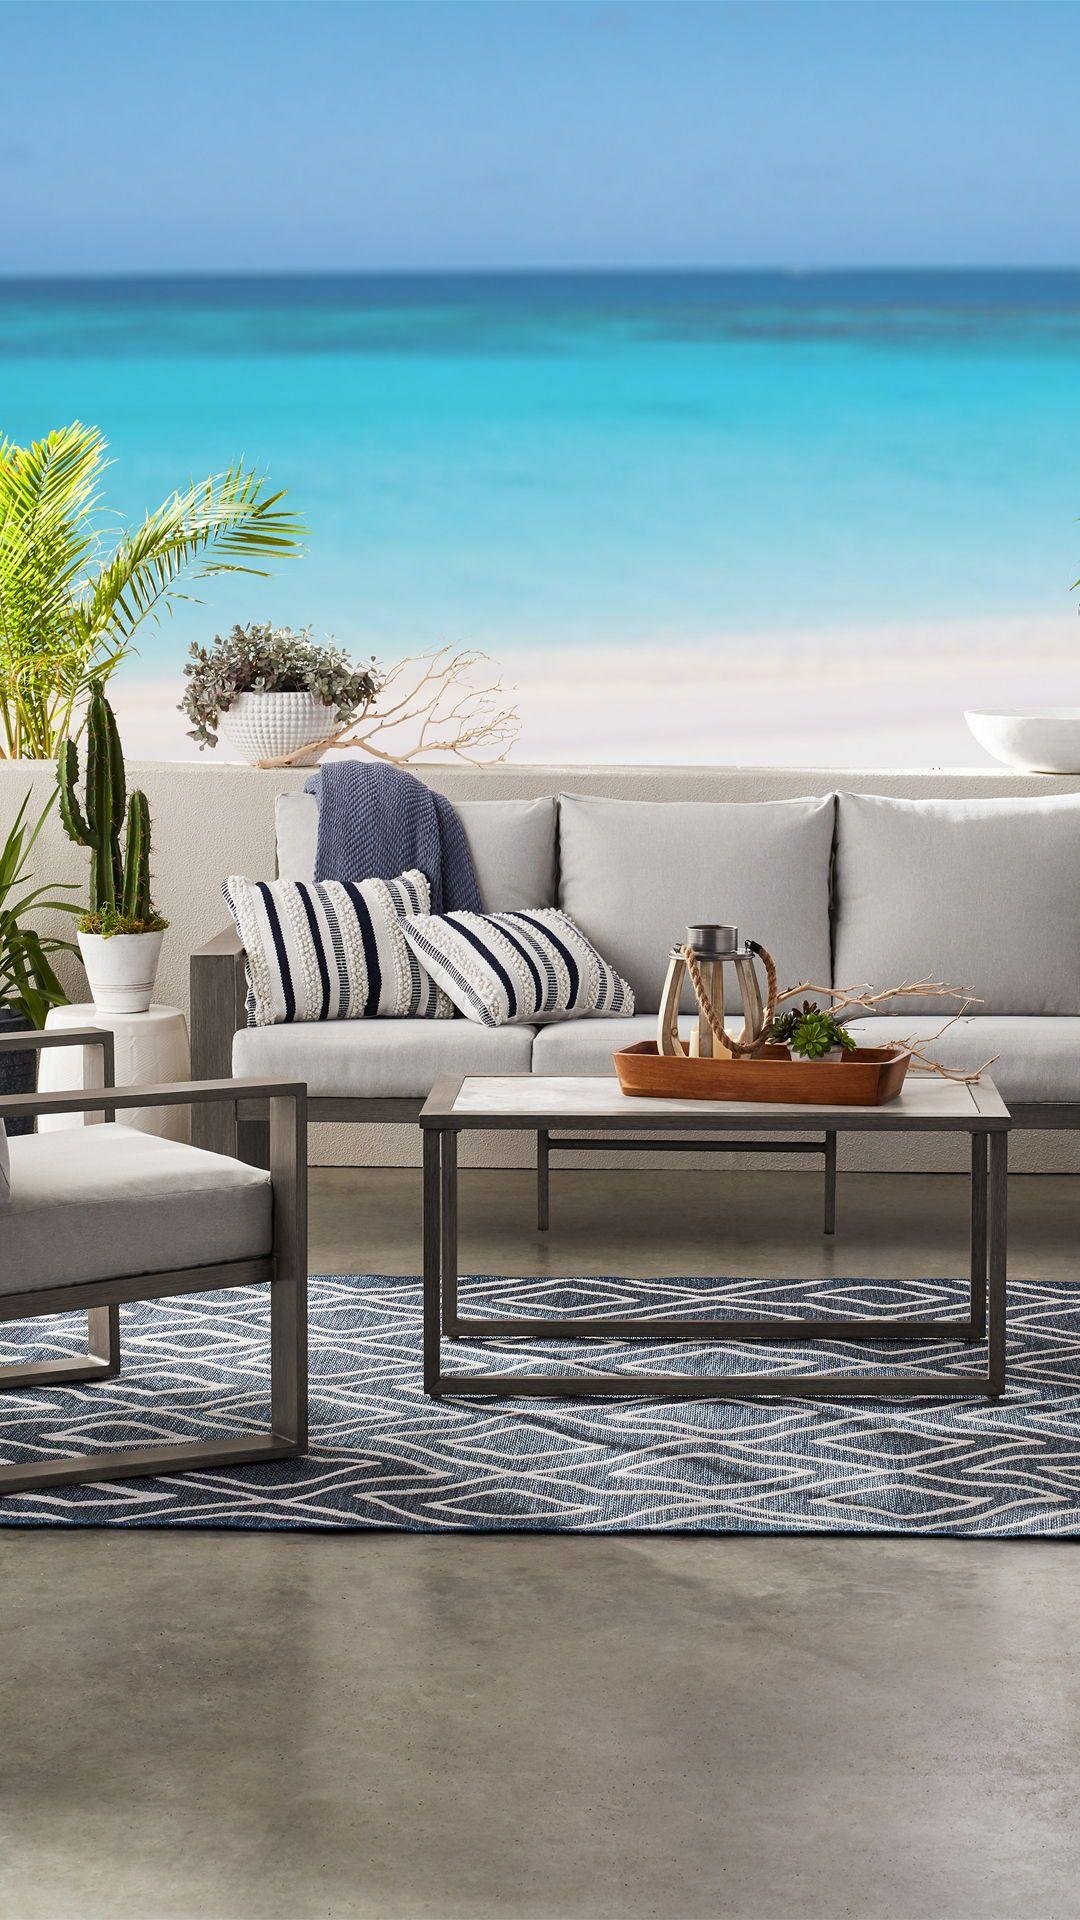 Belle Haven 4 Piece Conversation Outdoor Furniture Set Patio Porch Deck Furniture Sof In 2020 Outdoor Furniture Collections Outdoor Furniture Sets Outdoor Living